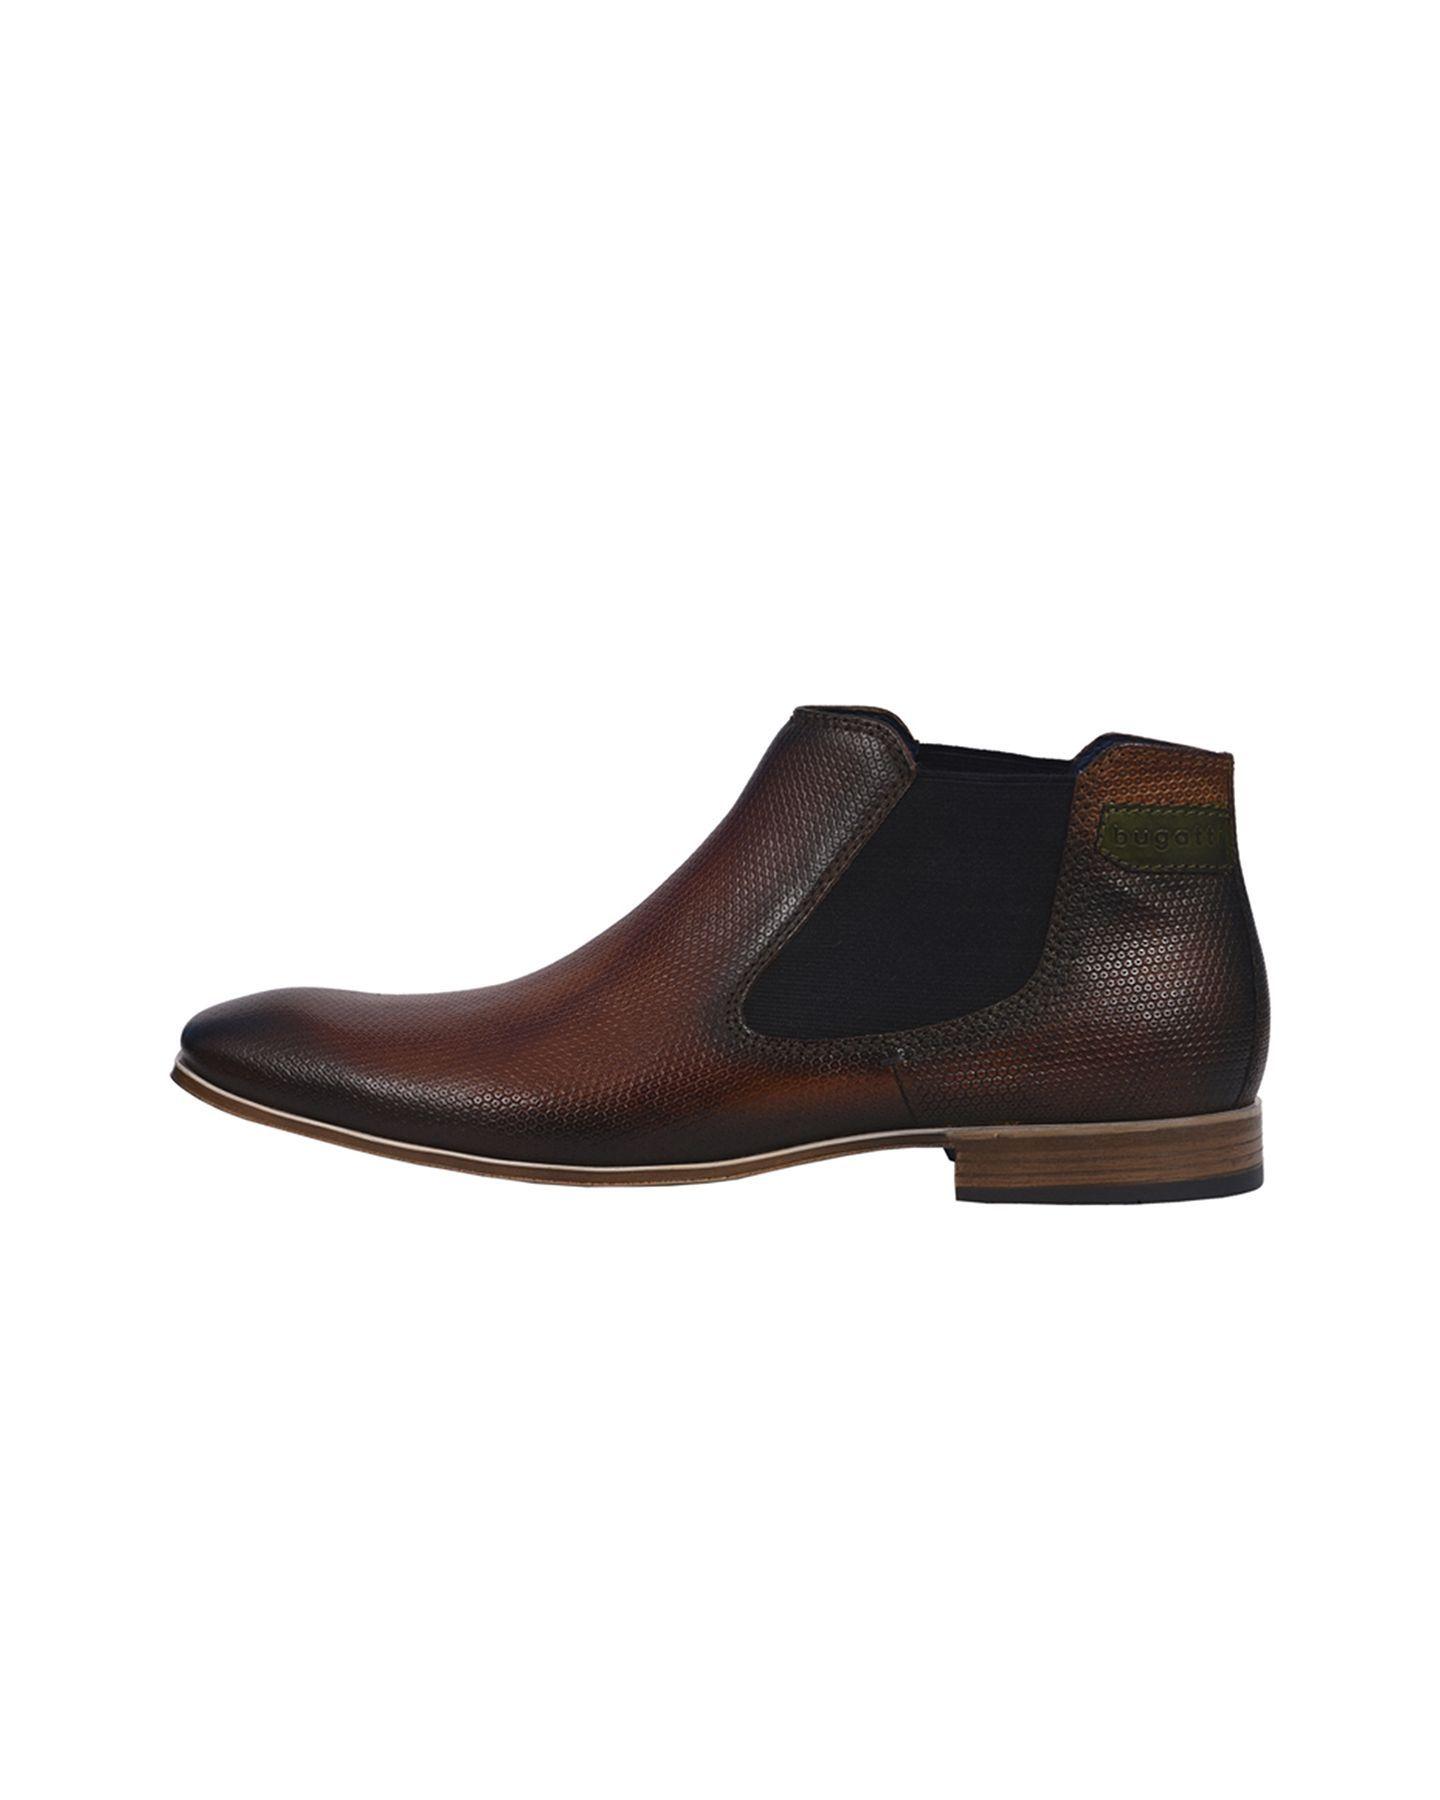 bugatti Chelsea boots in cognac in Größe 47